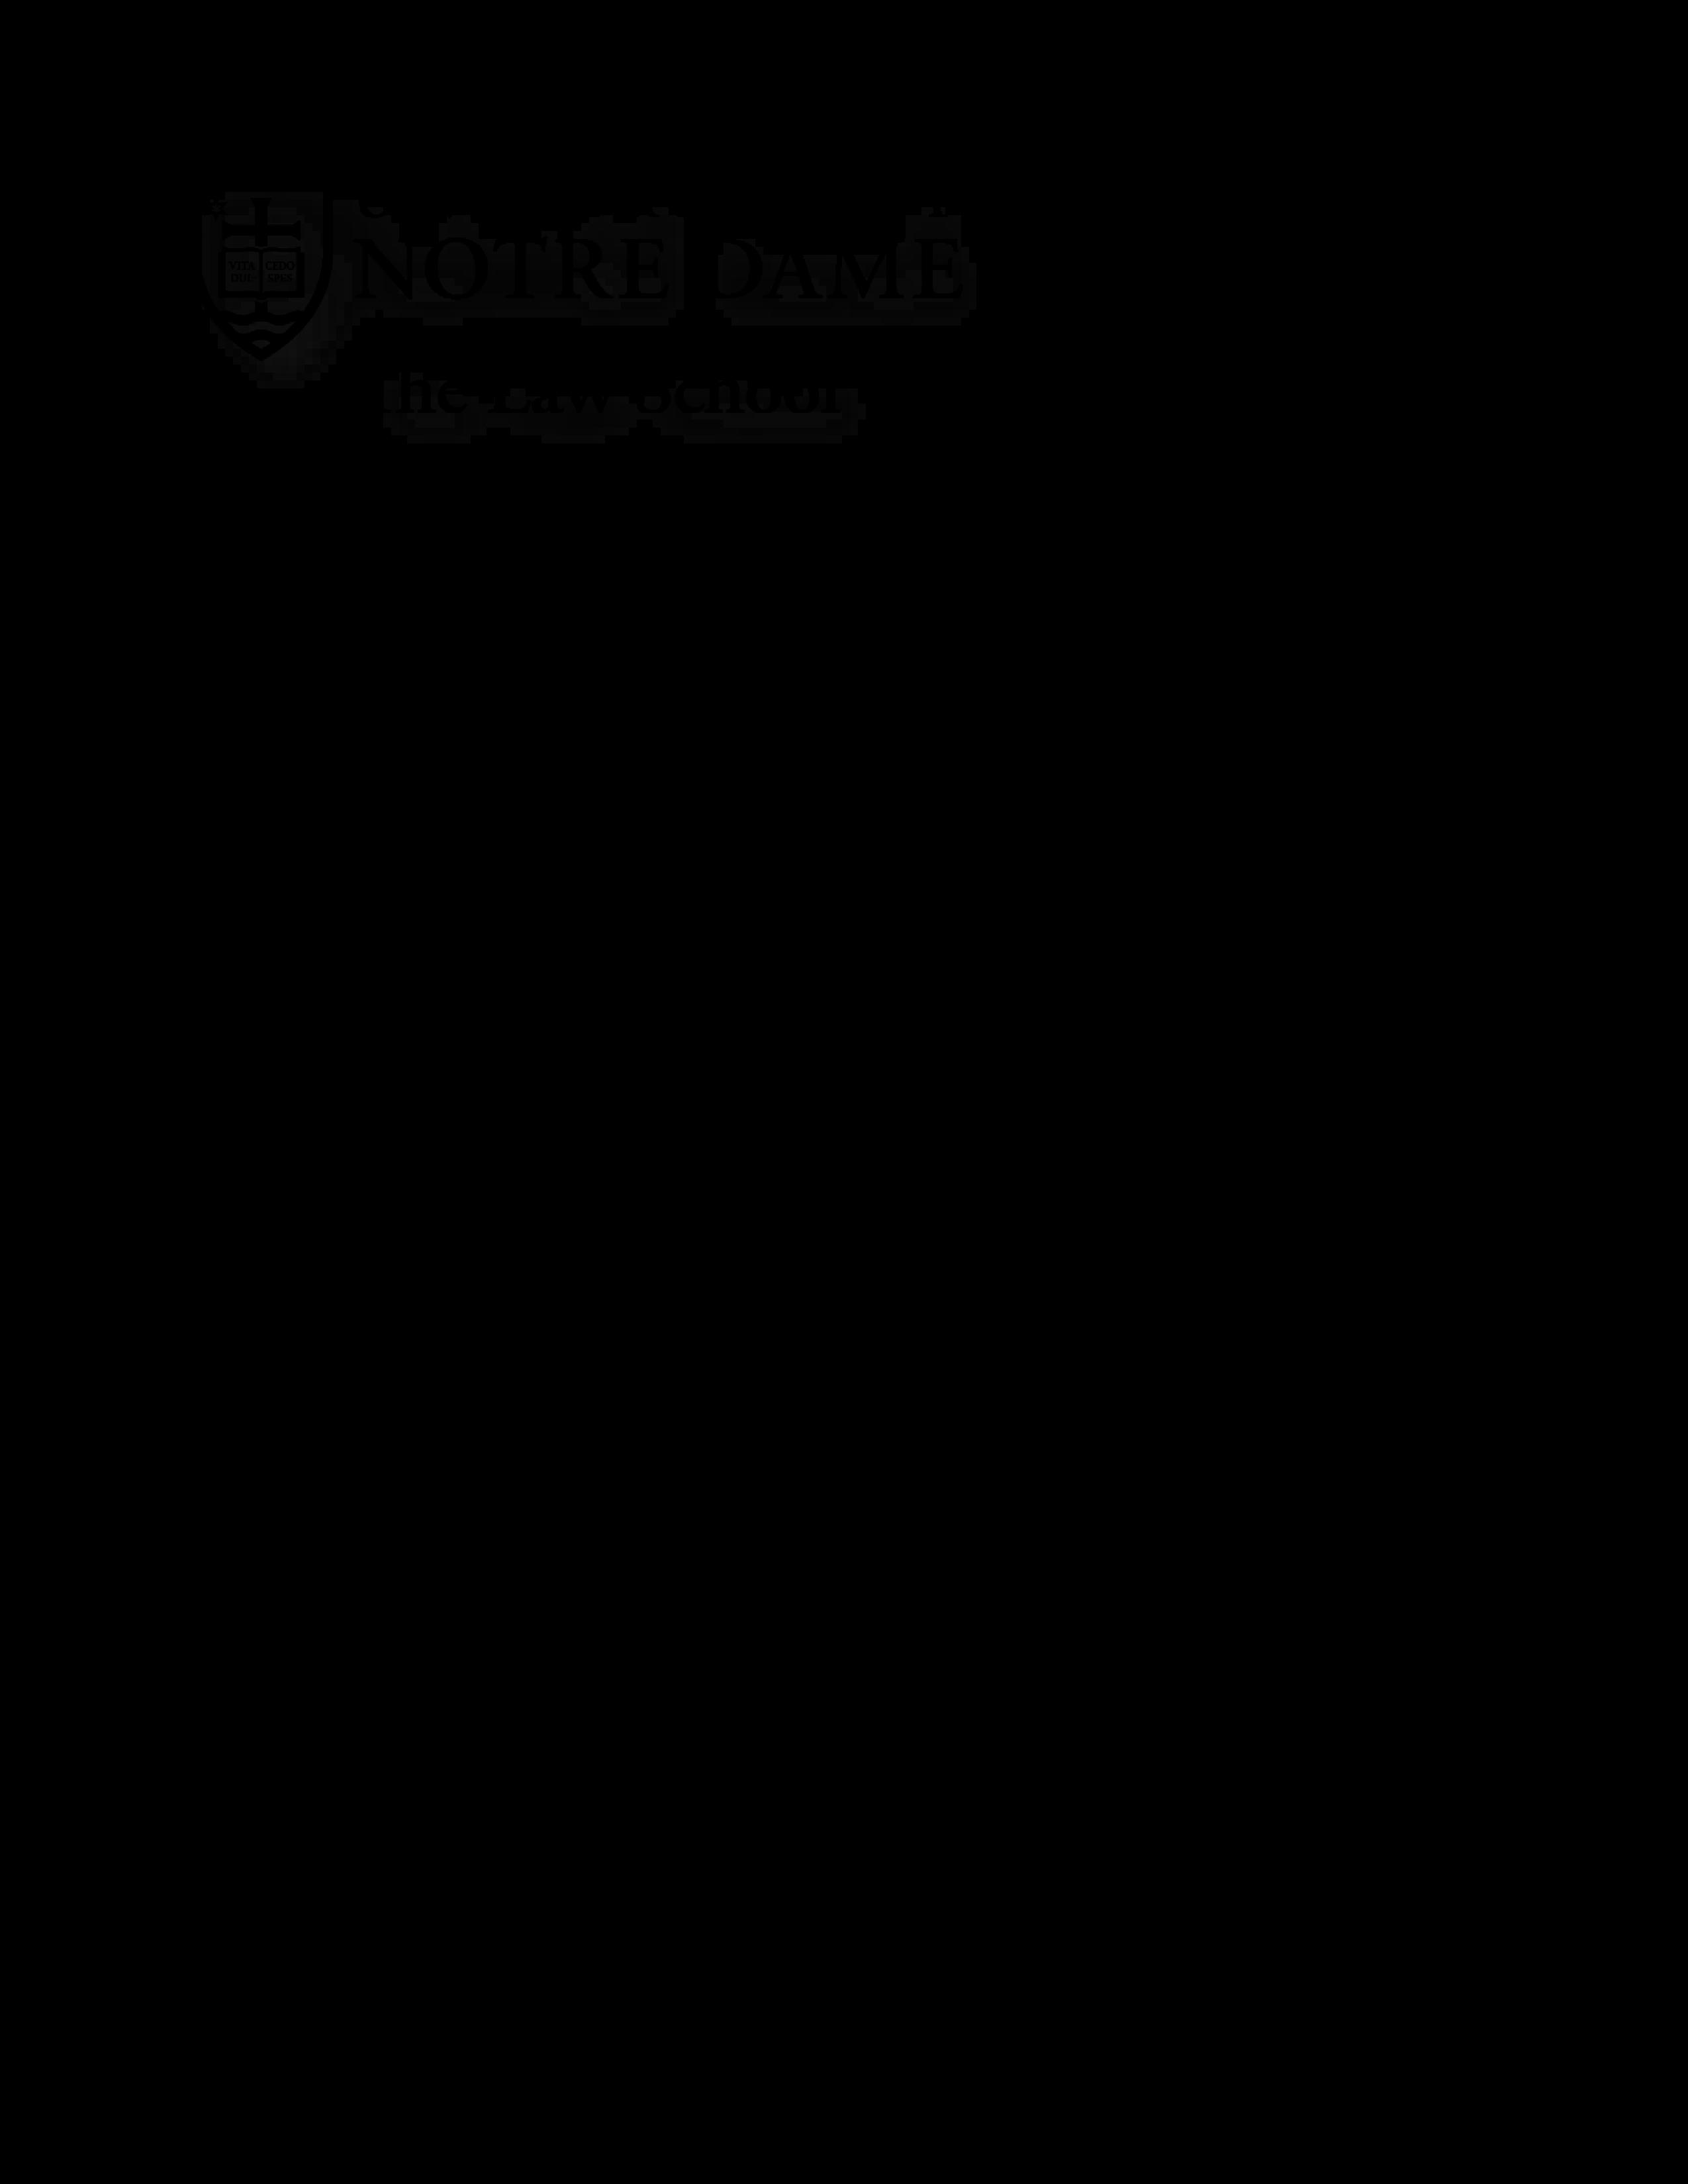 Clerkship Cover Letter | Templates at allbusinesstemplates.com